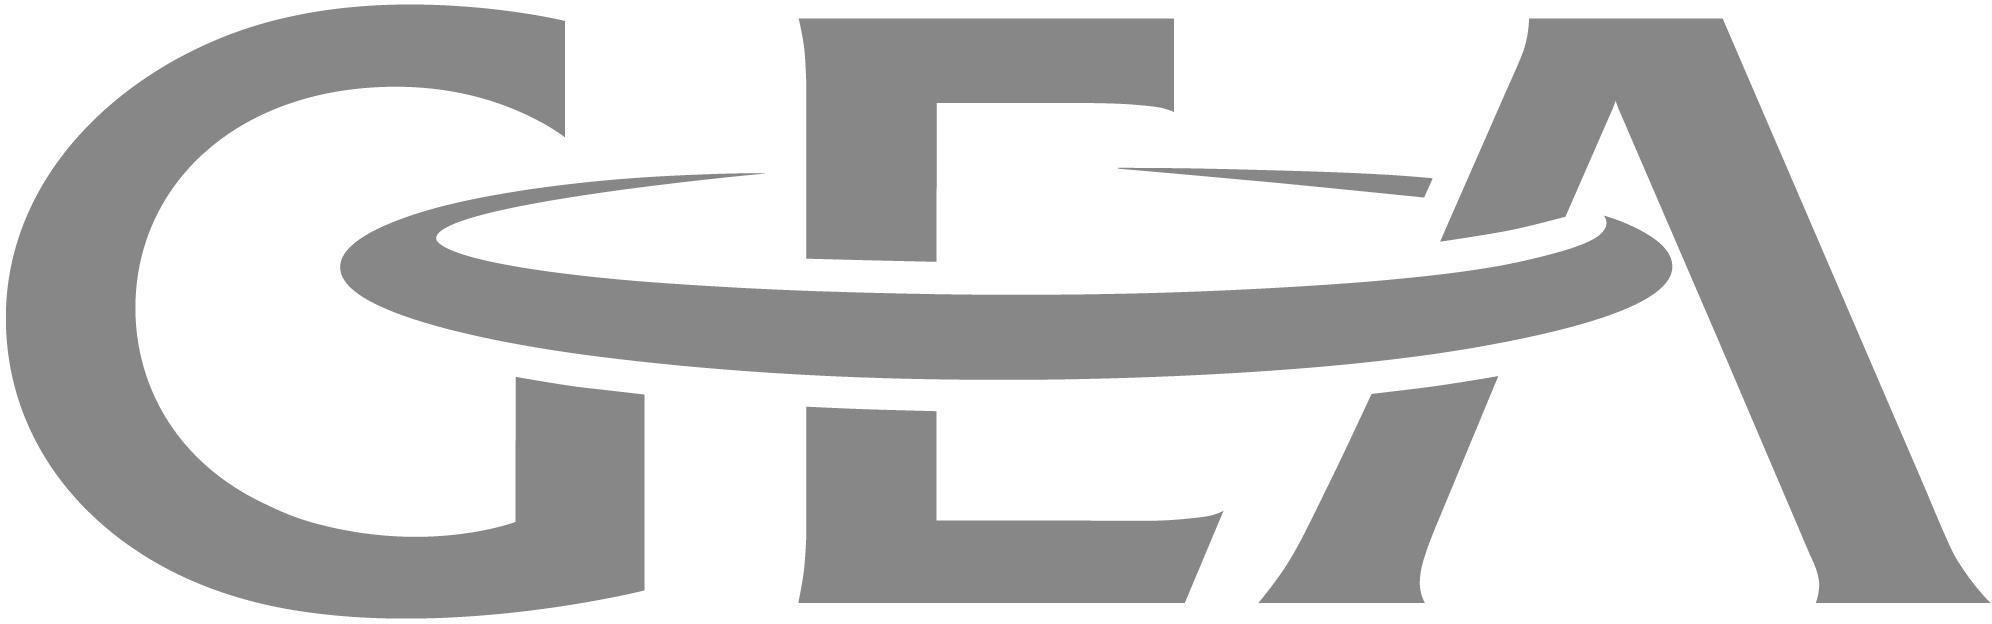 gea logo.jpg